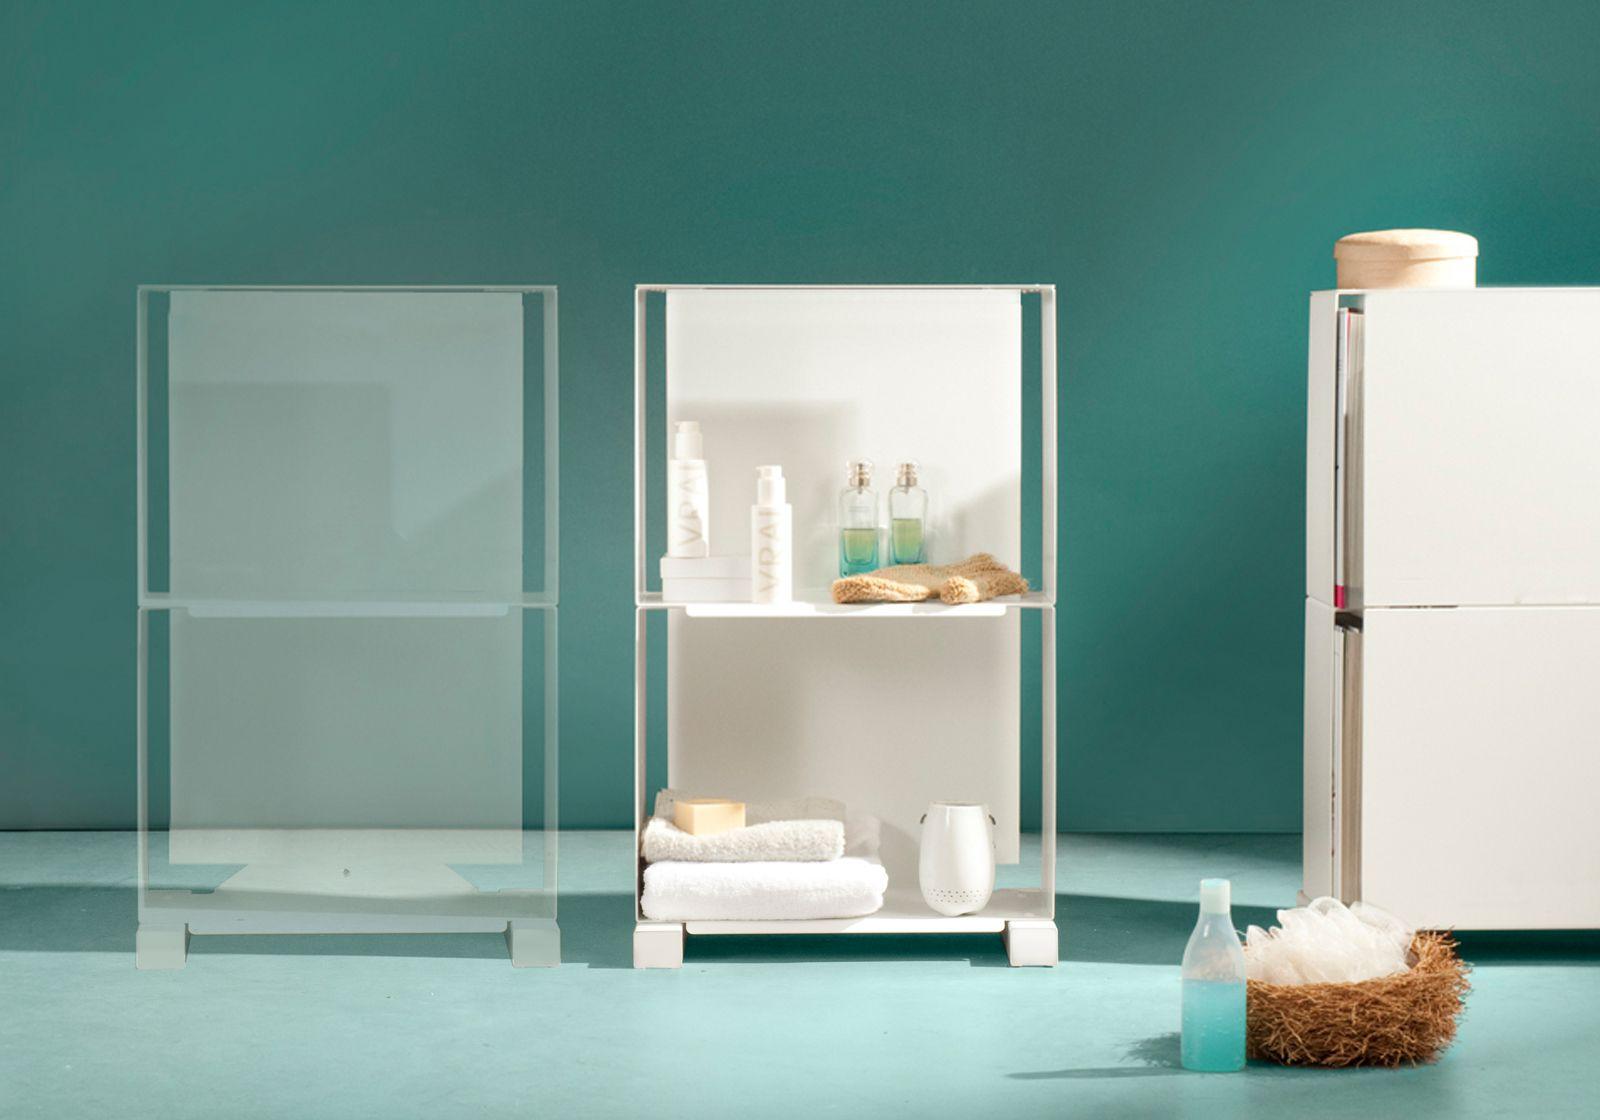 shelf design 2vb - l 45 cm, p 25 cm, h 72 cm - teebooks - Meuble Design Nice